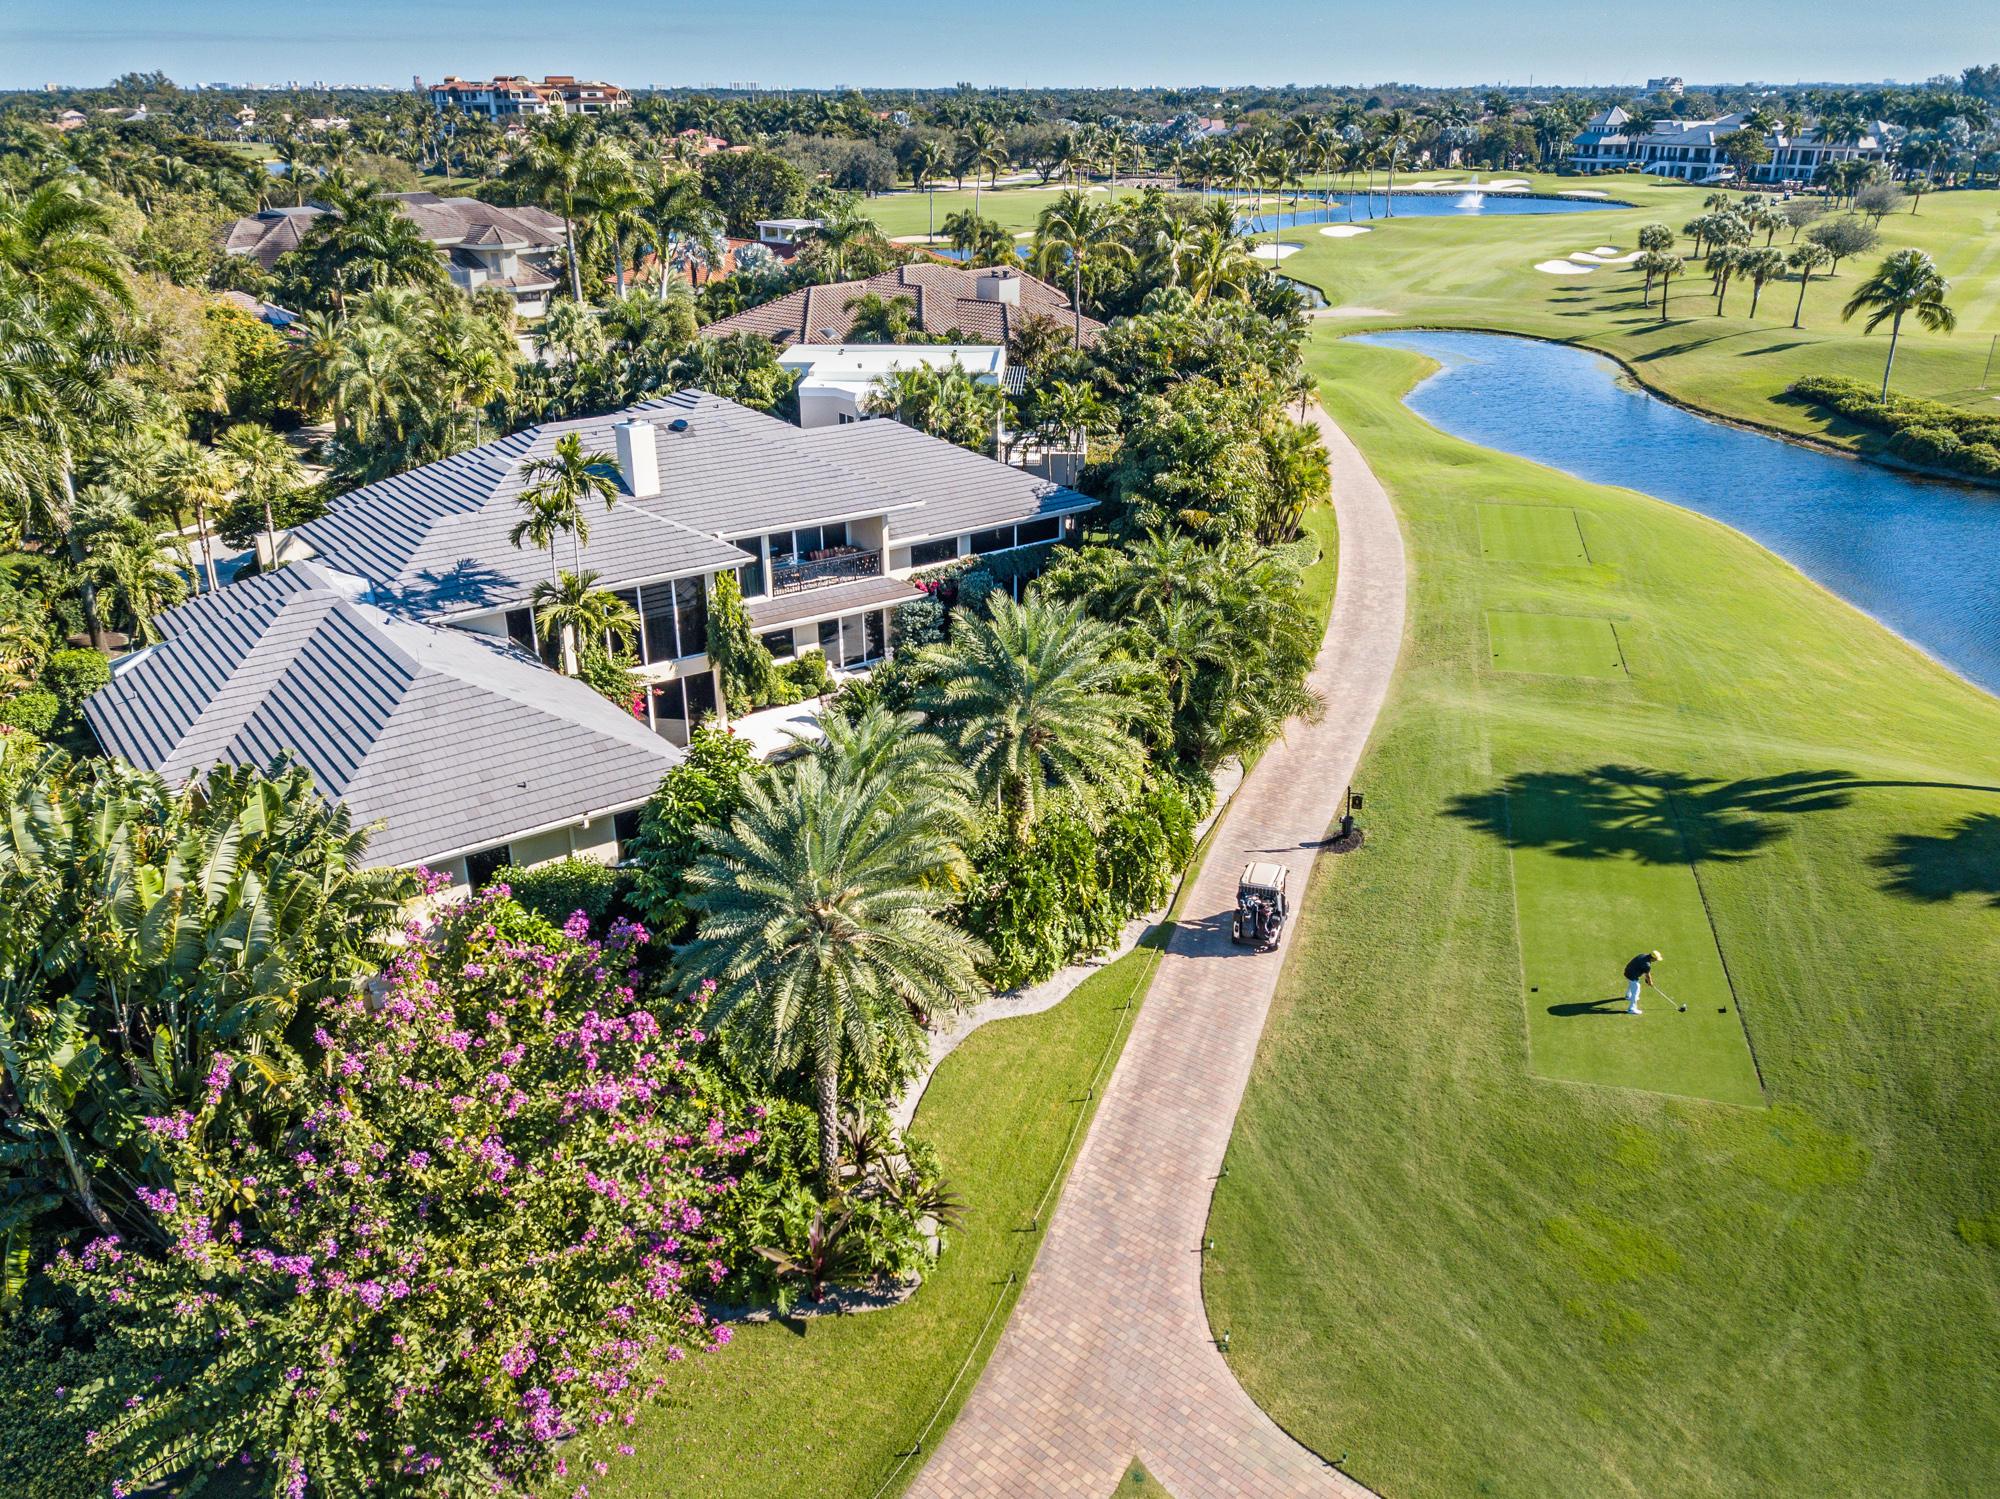 Photo of 21023 Rosedown Court, Boca Raton, FL 33433